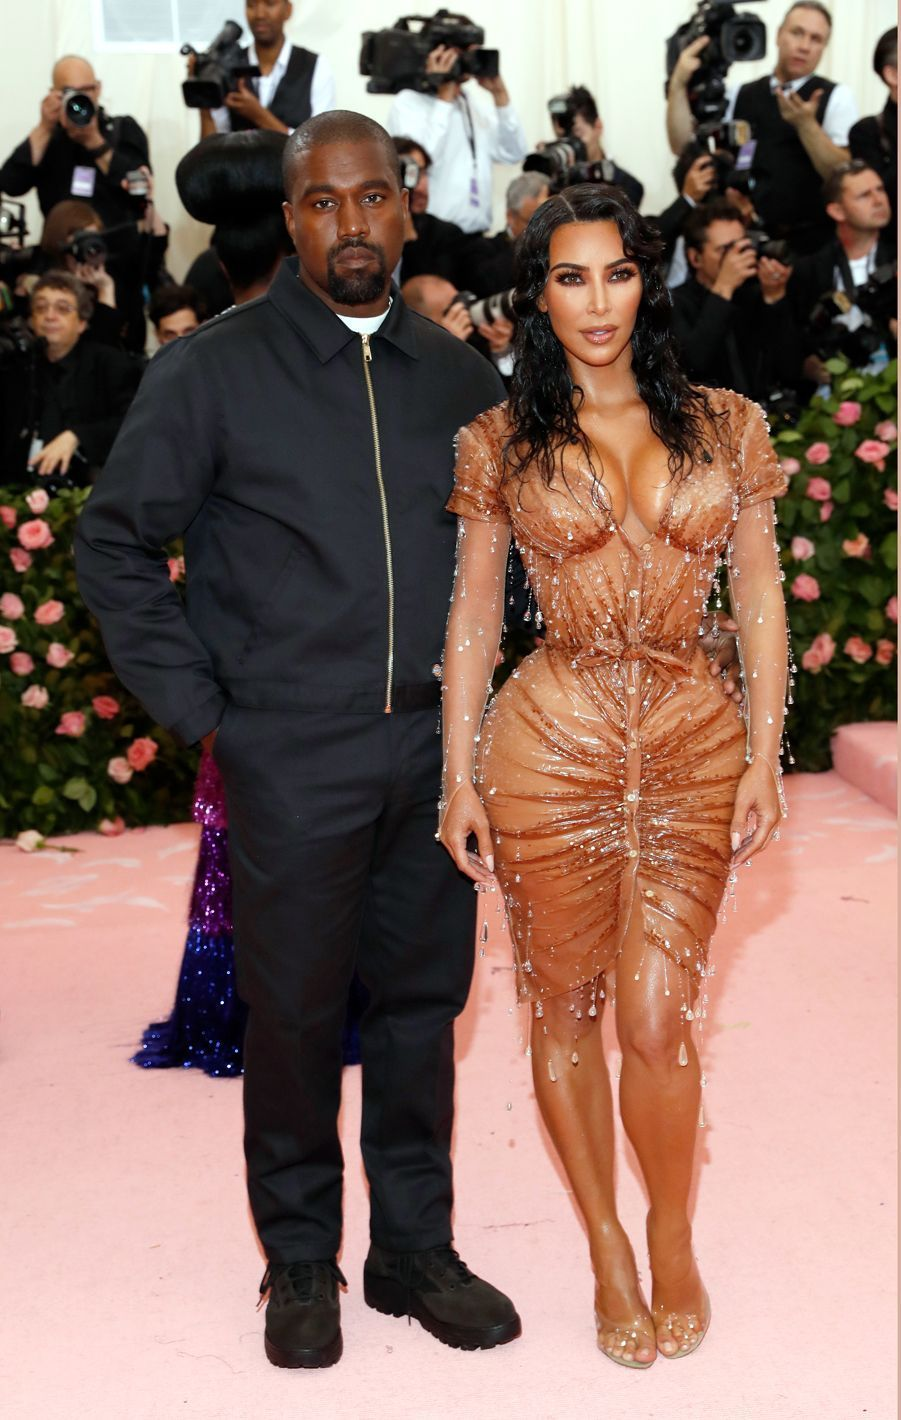 Kanye West et Kim Kardashianau MET Gala à New York le 6 mai 2019